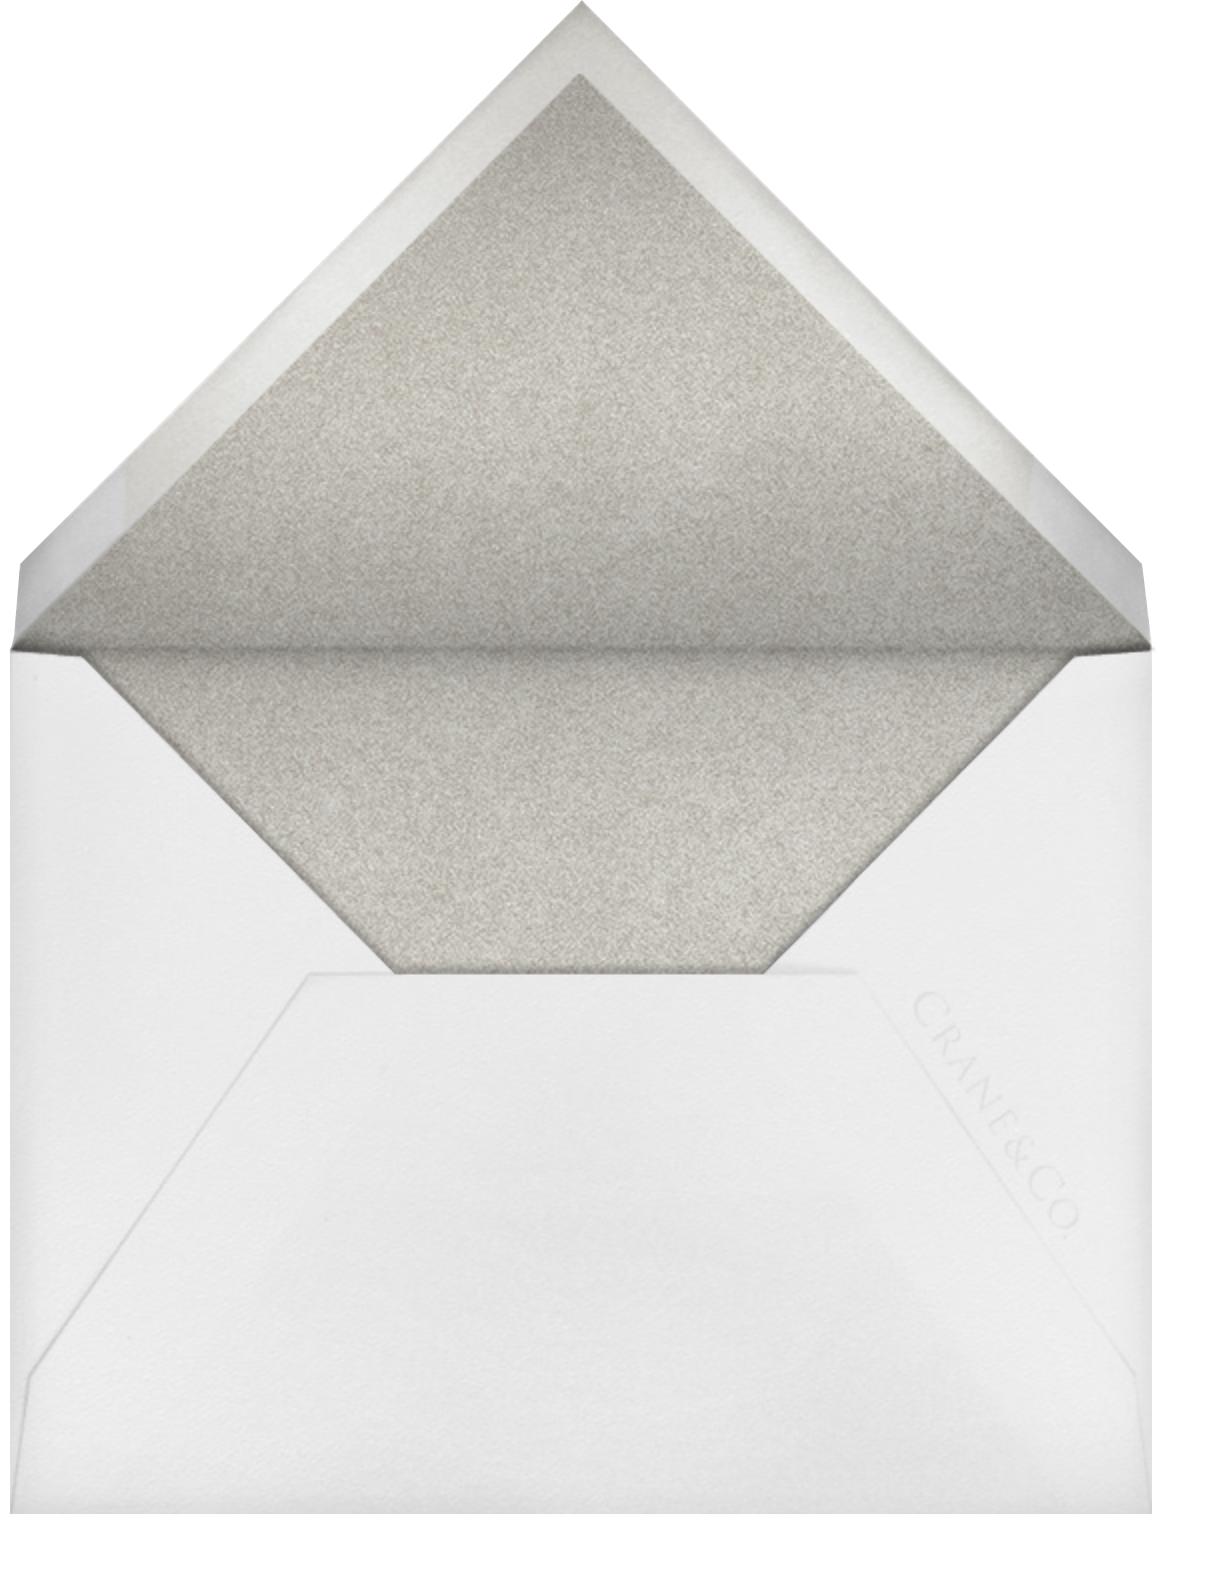 Forsythia (Save The Date) - Platinum - Crane & Co. - Save the date - envelope back